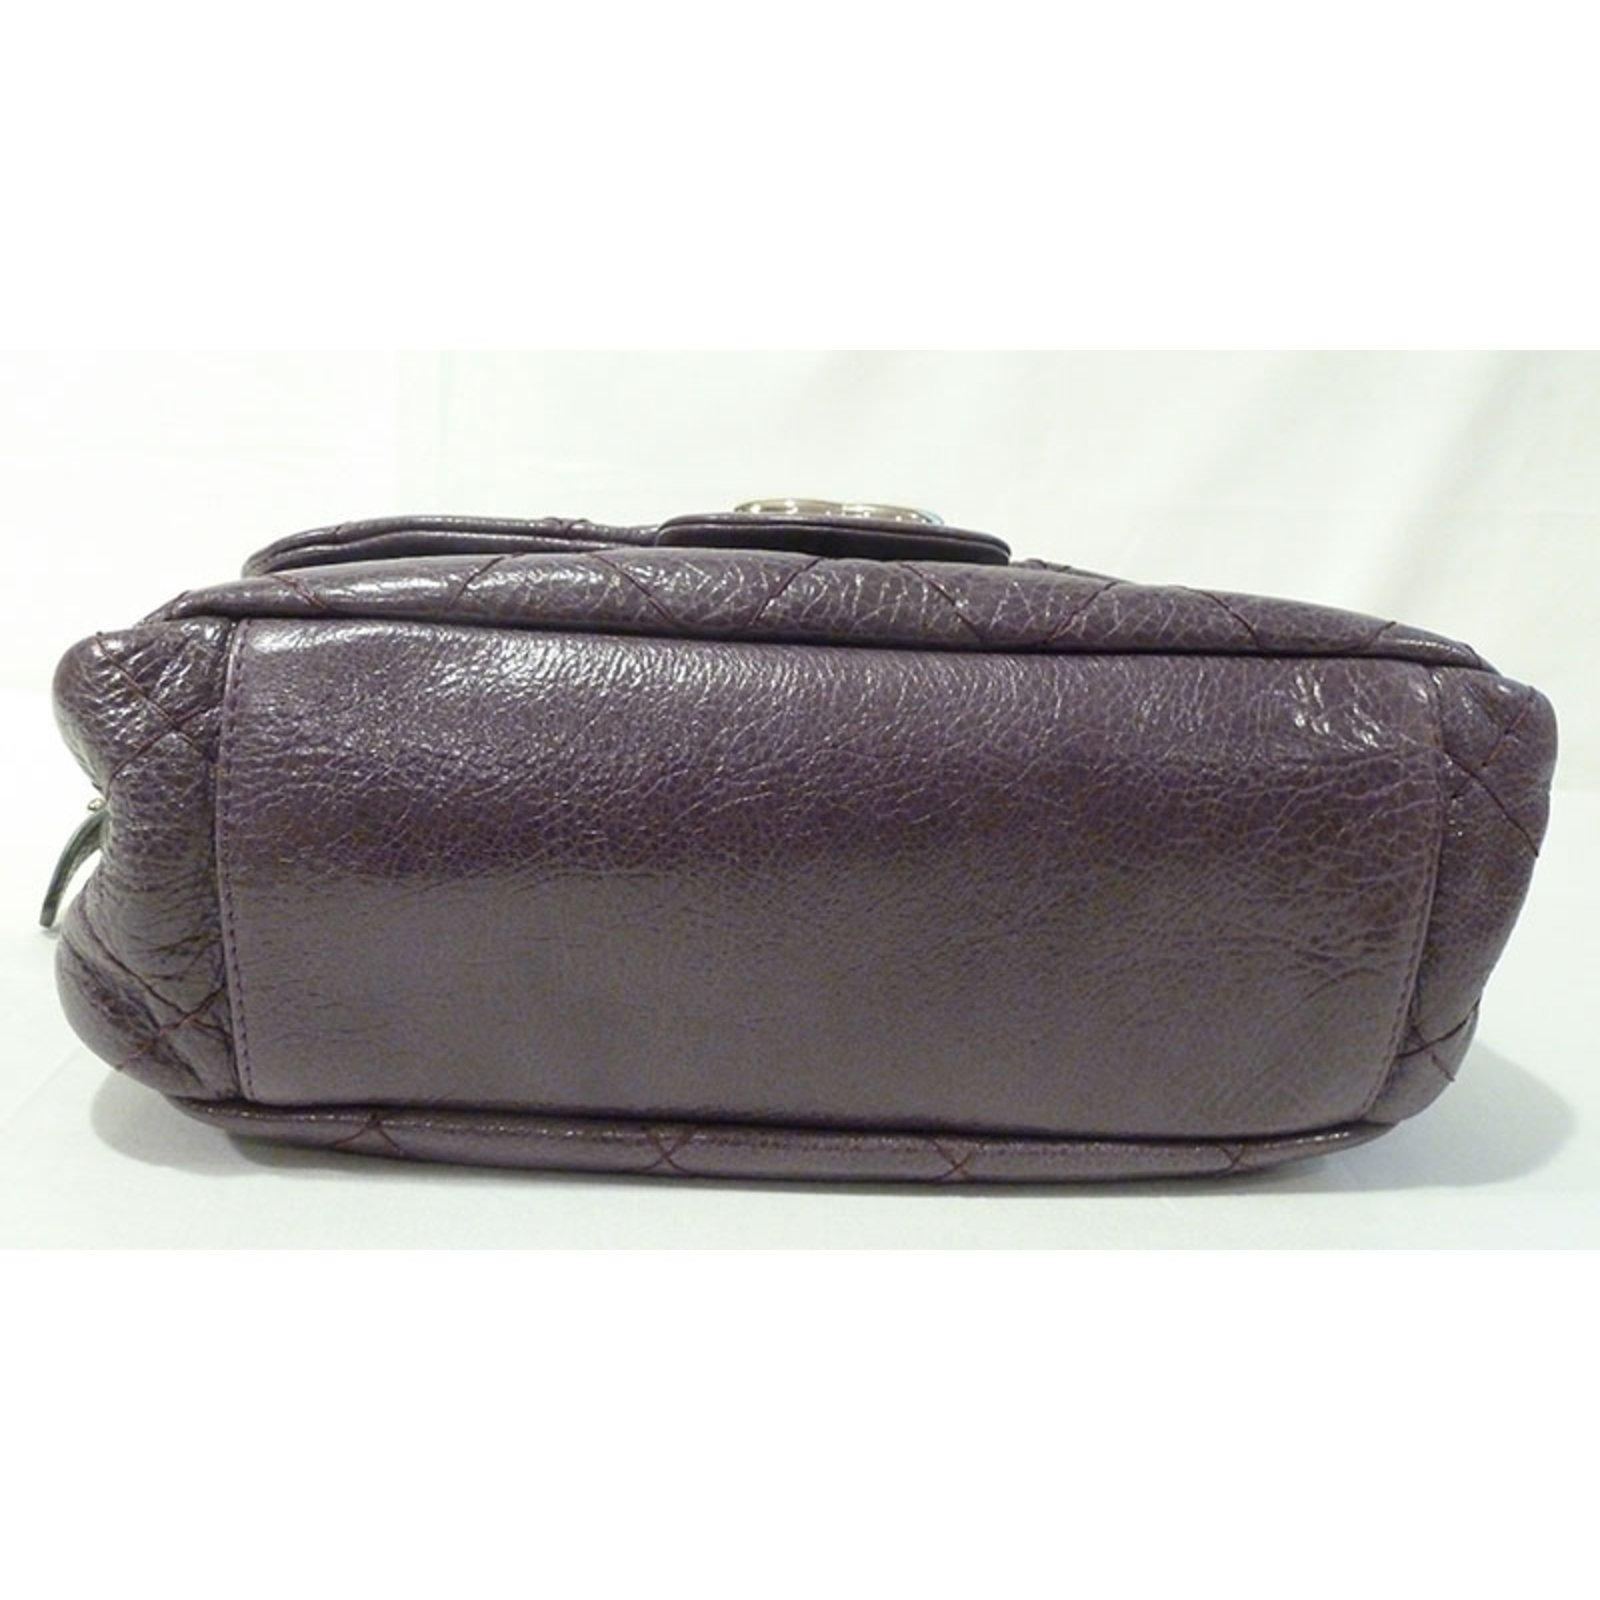 d684b02b1dae Chanel Chanel Road Flap Shoulder Bag Handbags Leather Purple ref.21619 -  Joli Closet